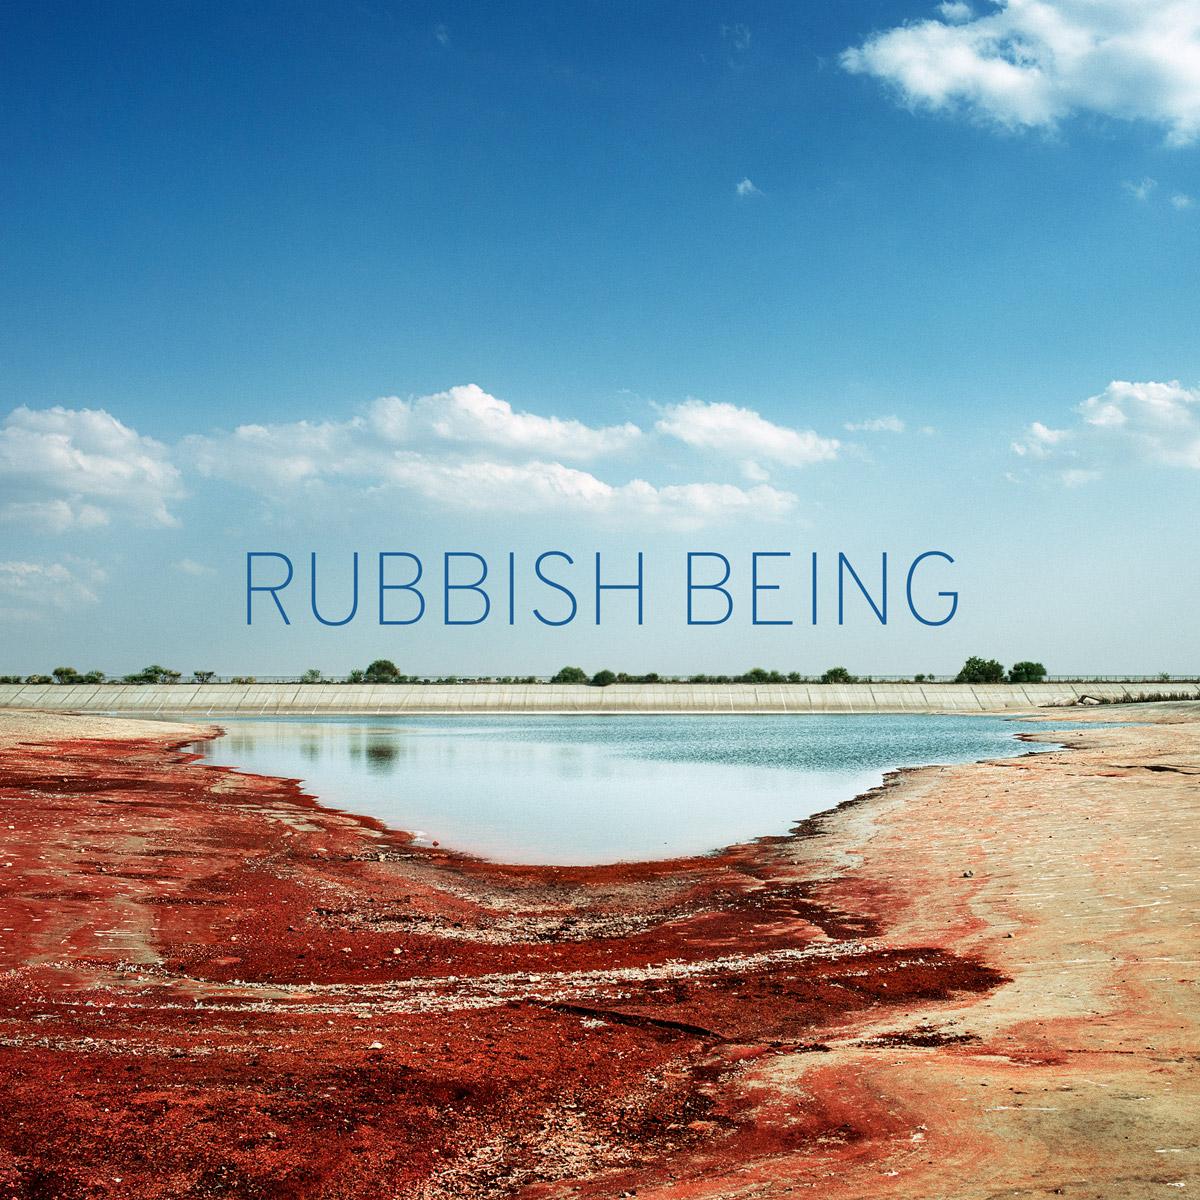 RUBBISH BEING